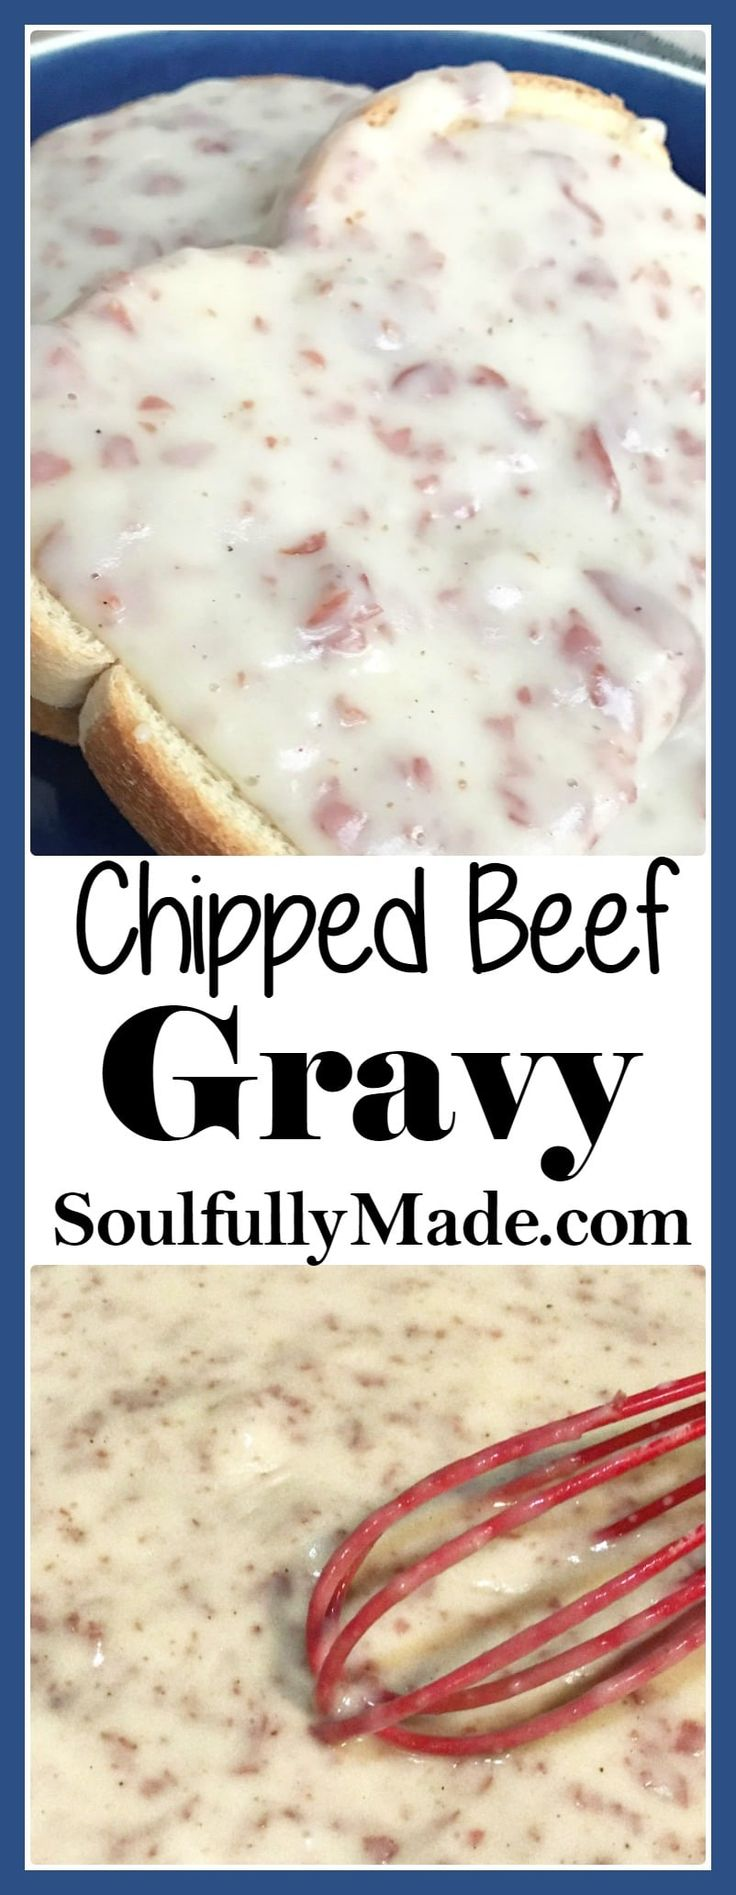 Chipped Beef Gravy